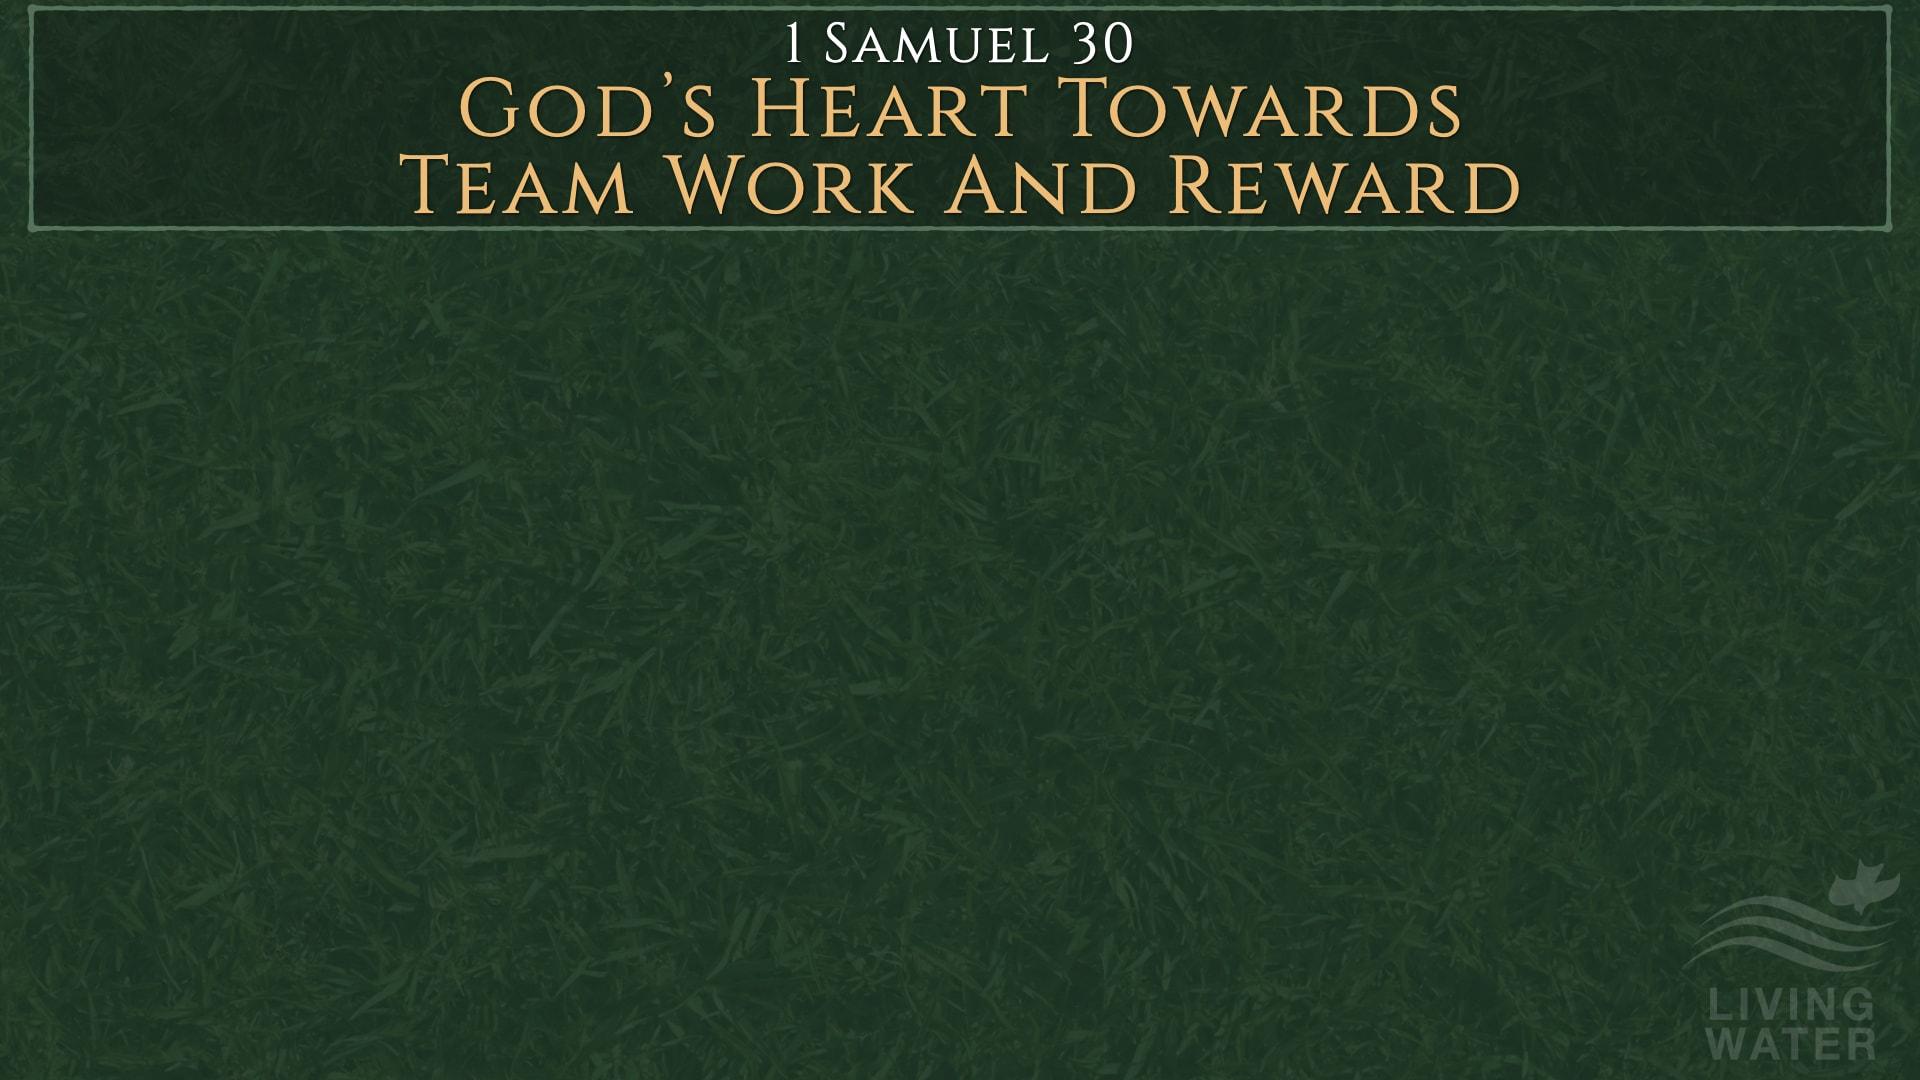 1 Samuel 30, God's Heart Towards Team Work And Reward